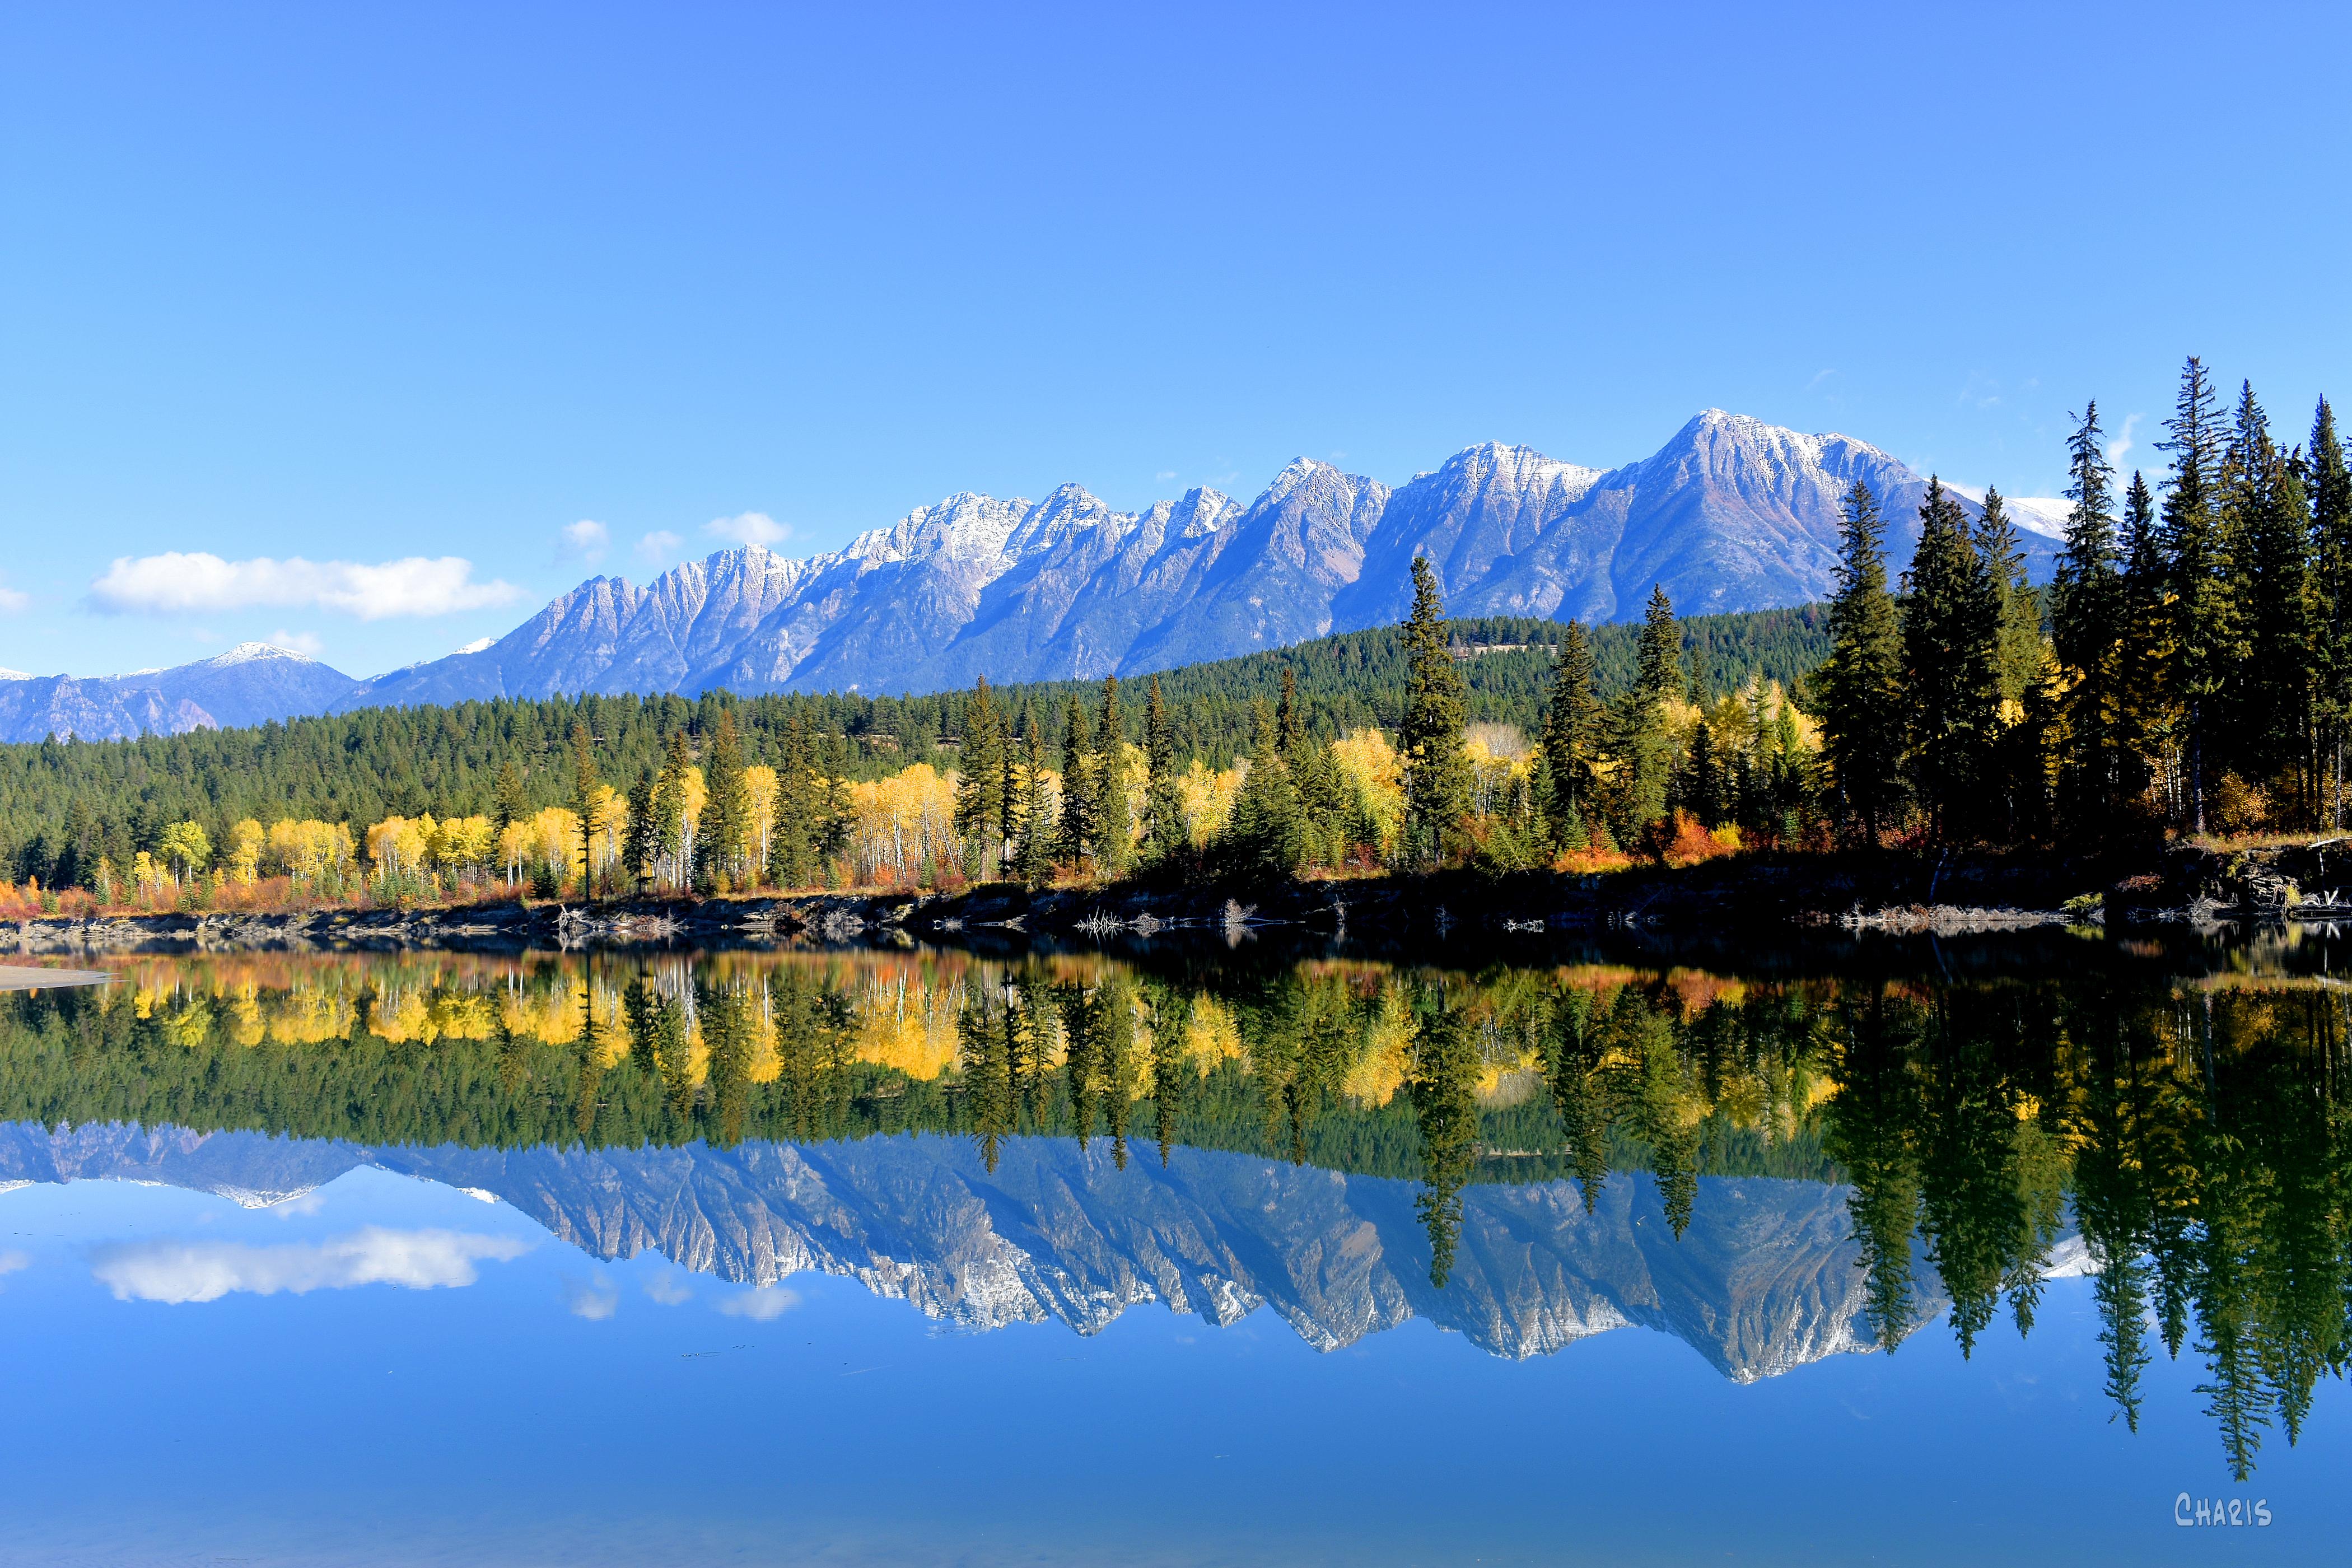 Kootenay river autumn ch rs DSC_0616